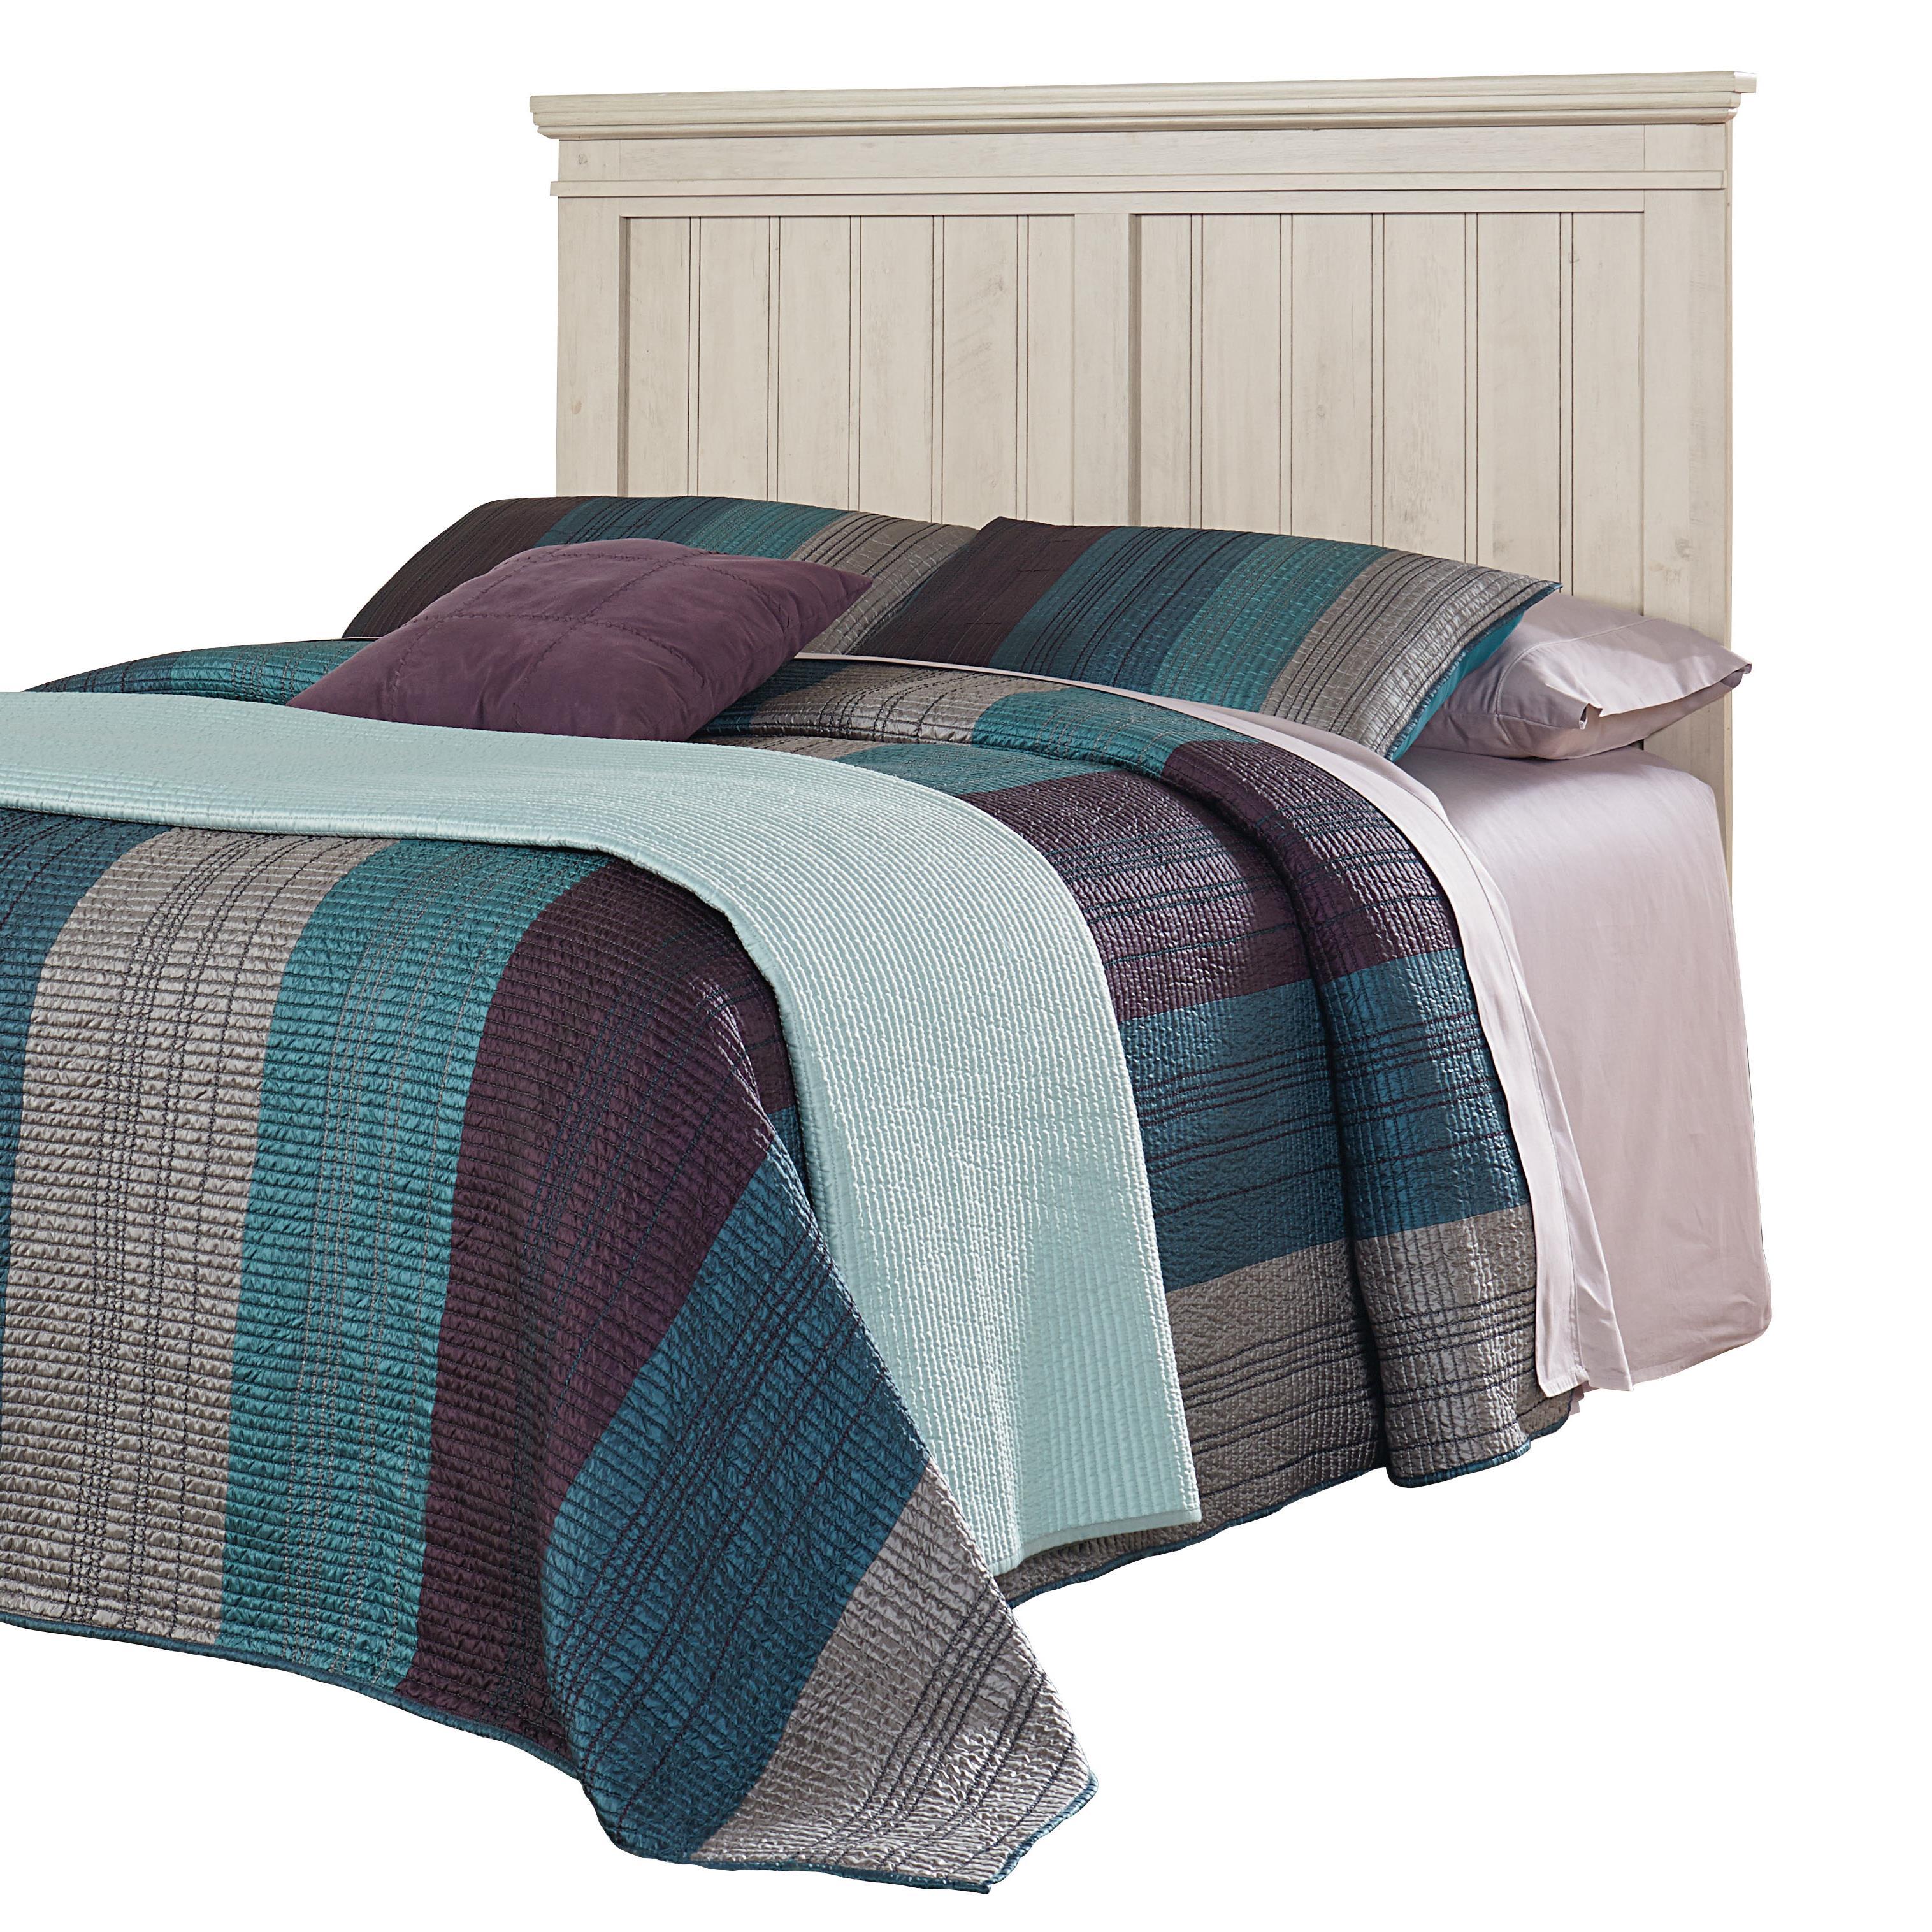 Standard Furniture Outland Lite Full/Queen Headboard            - Item Number: 62942